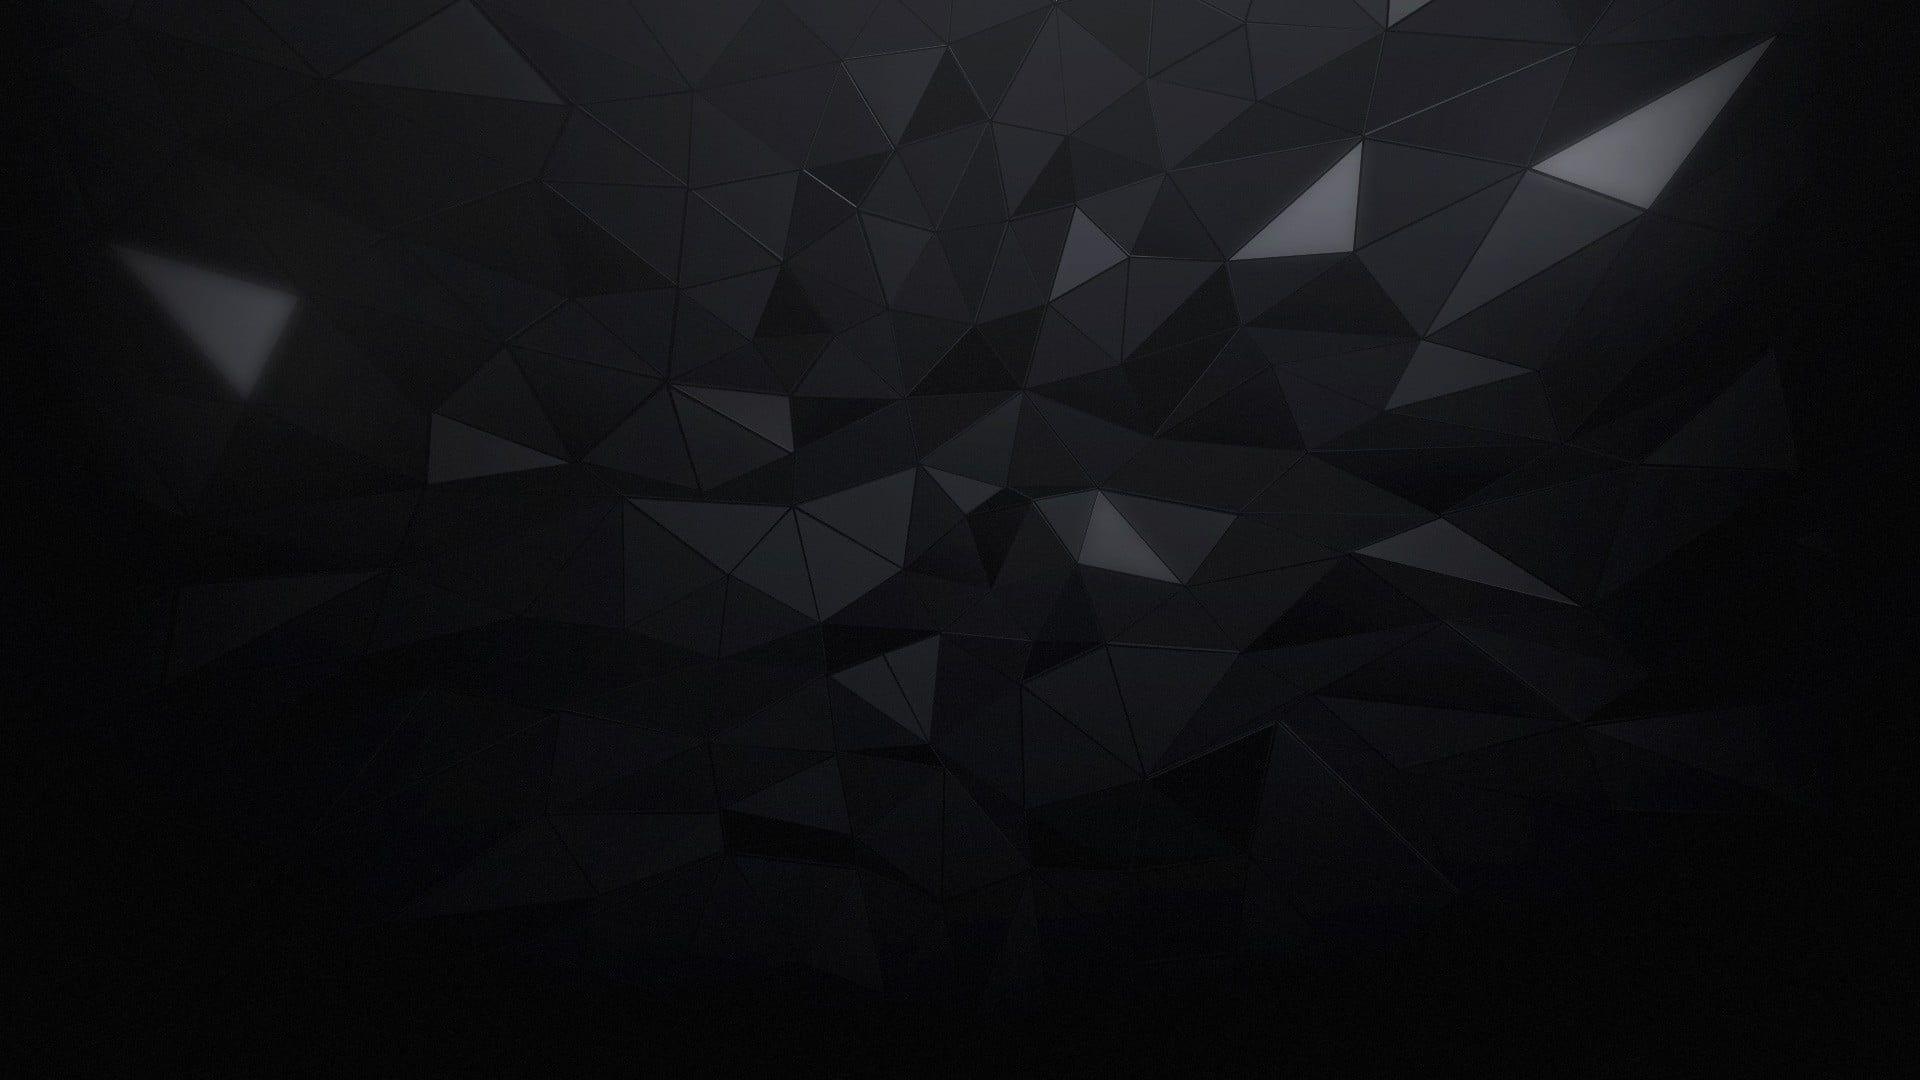 Black Crystal Illustration Minimalism Triangle Black Abstract 1080p Wallpaper Hdwallpaper Desktop In 2020 Abstract Crystal Illustration Abstract Artwork